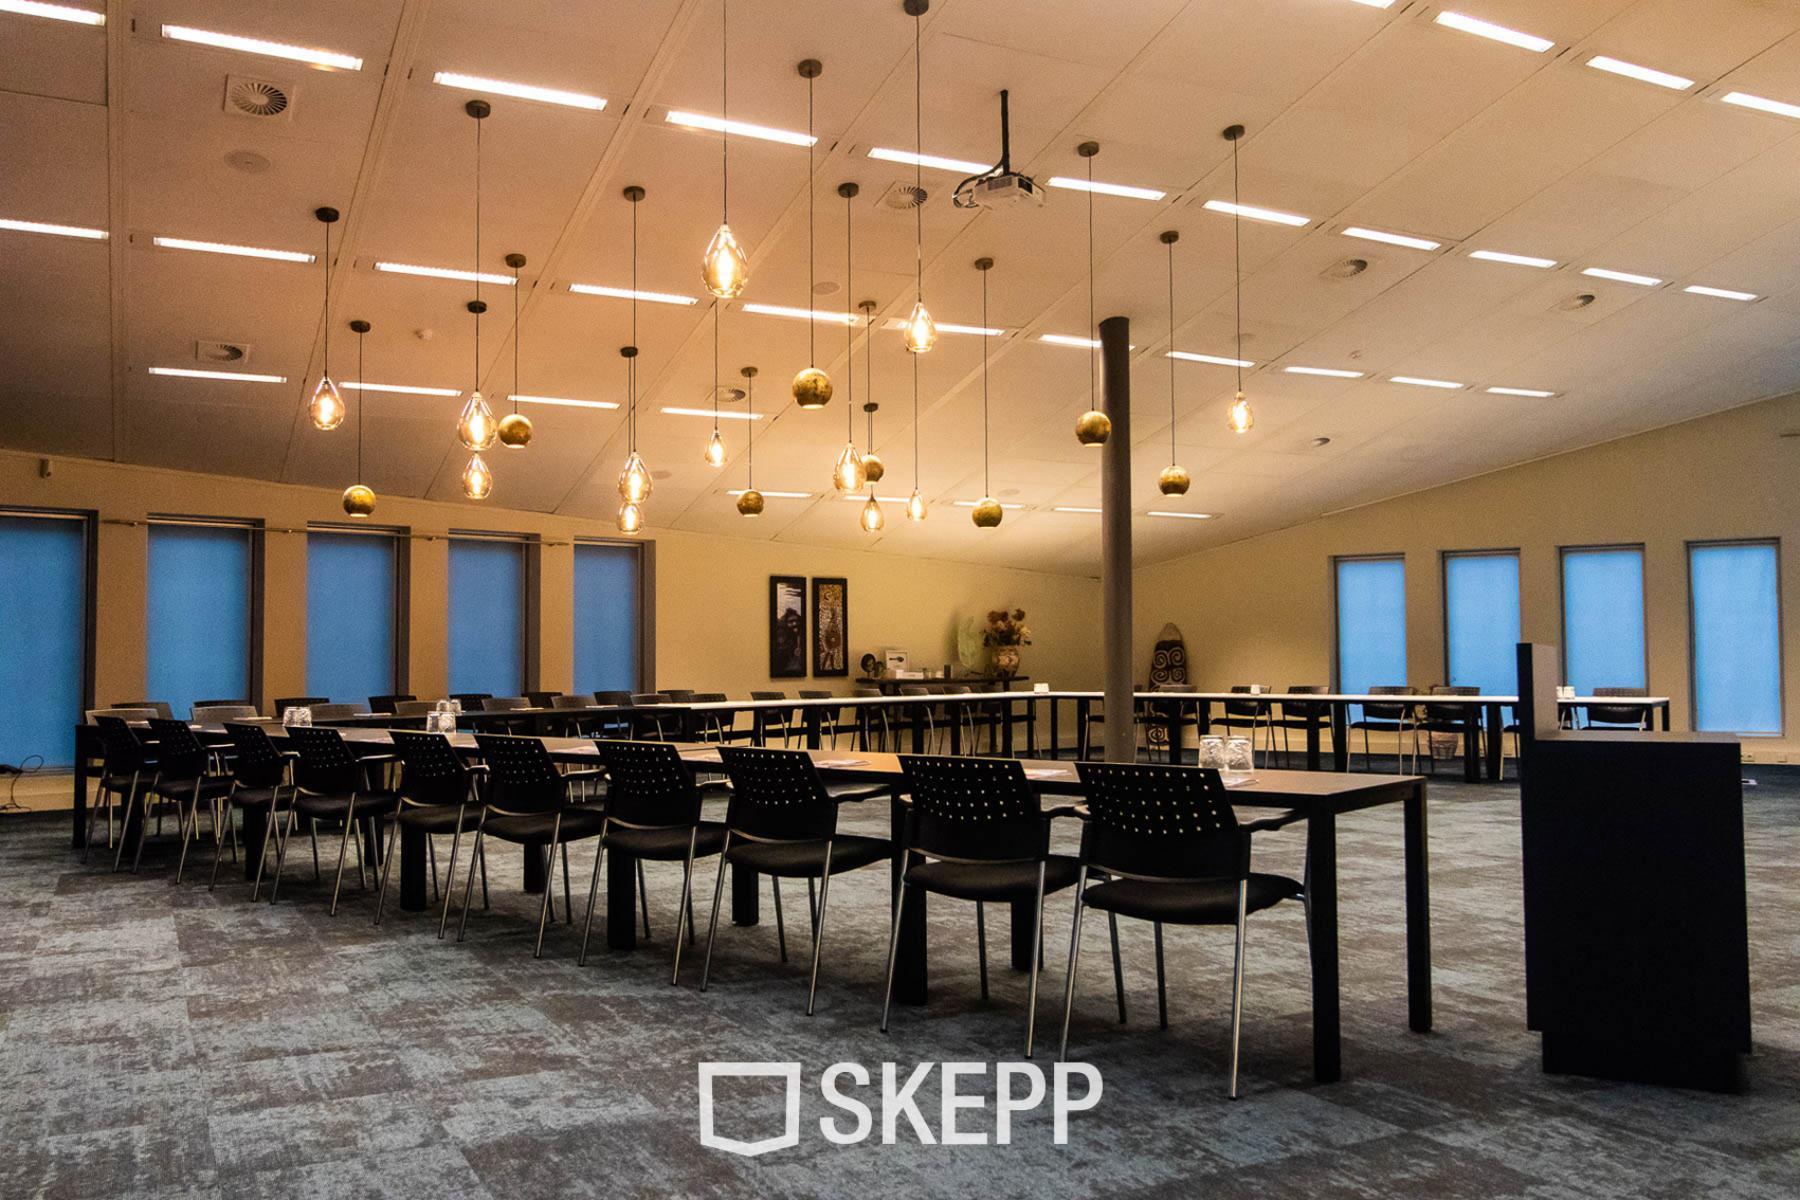 Office building meeting room